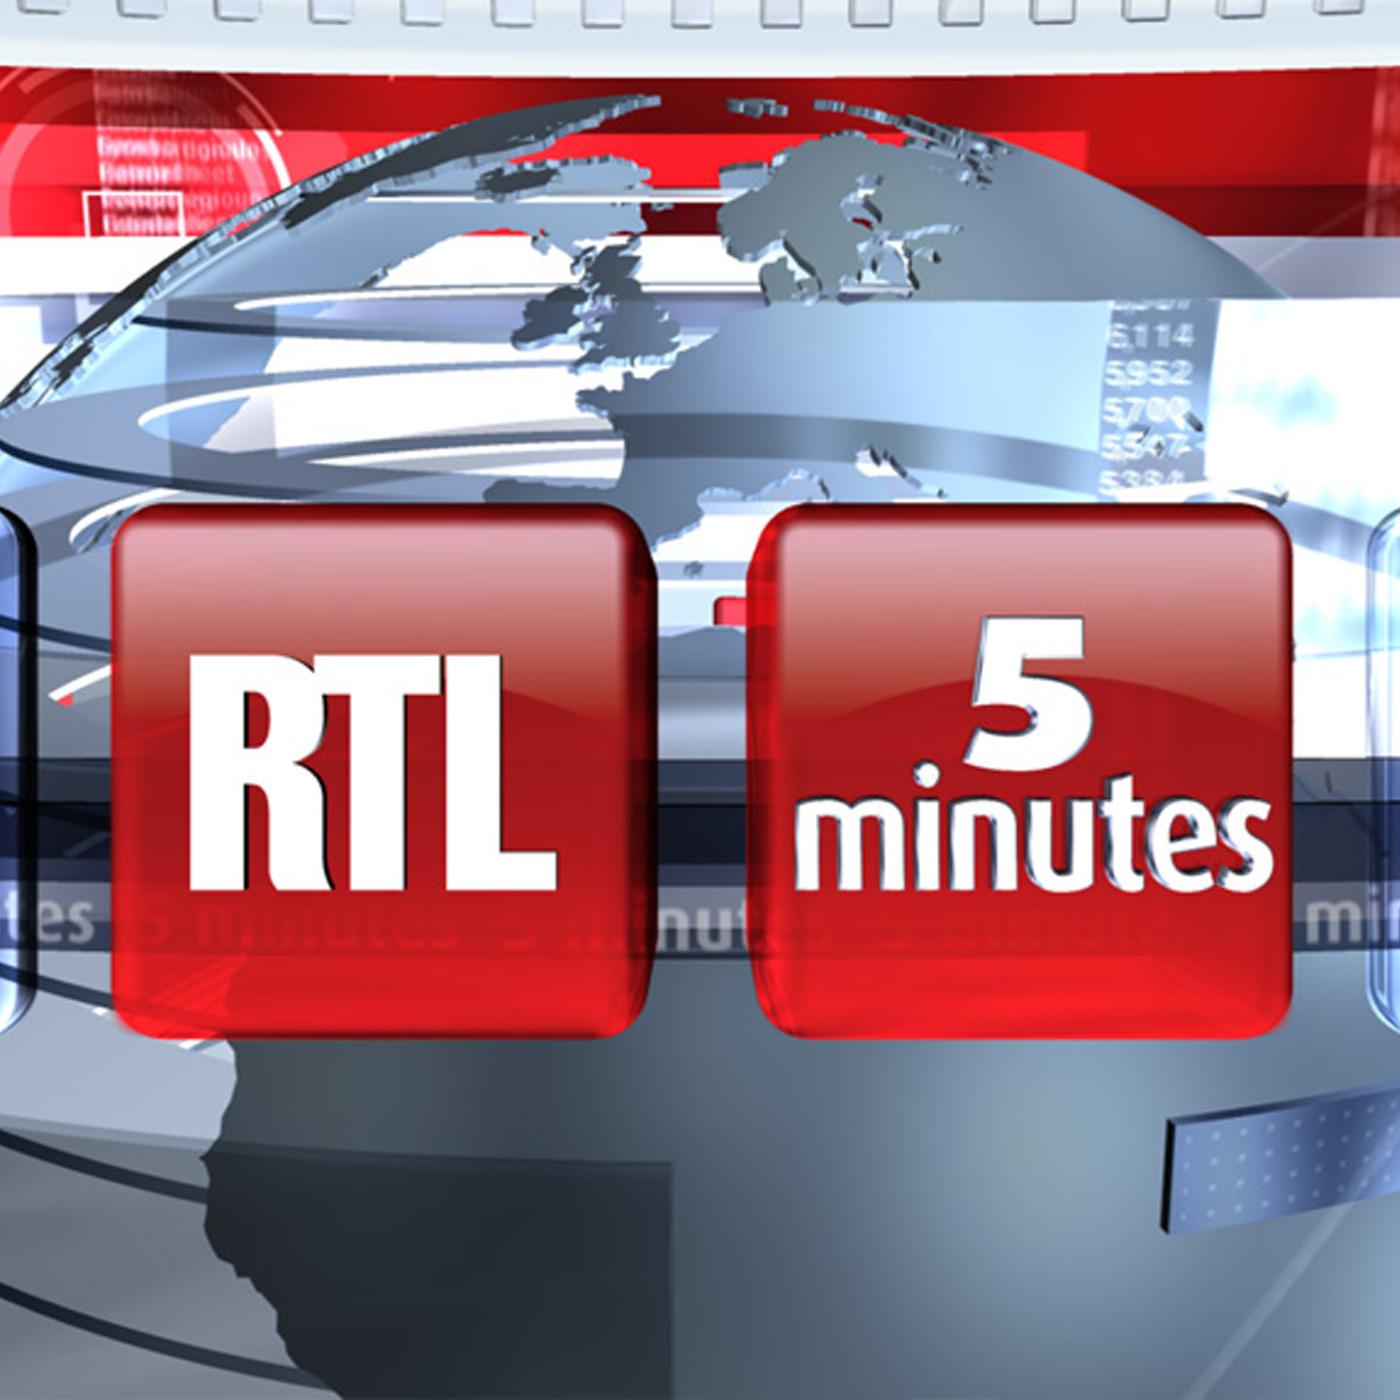 RTL - 5 minutes (Small)